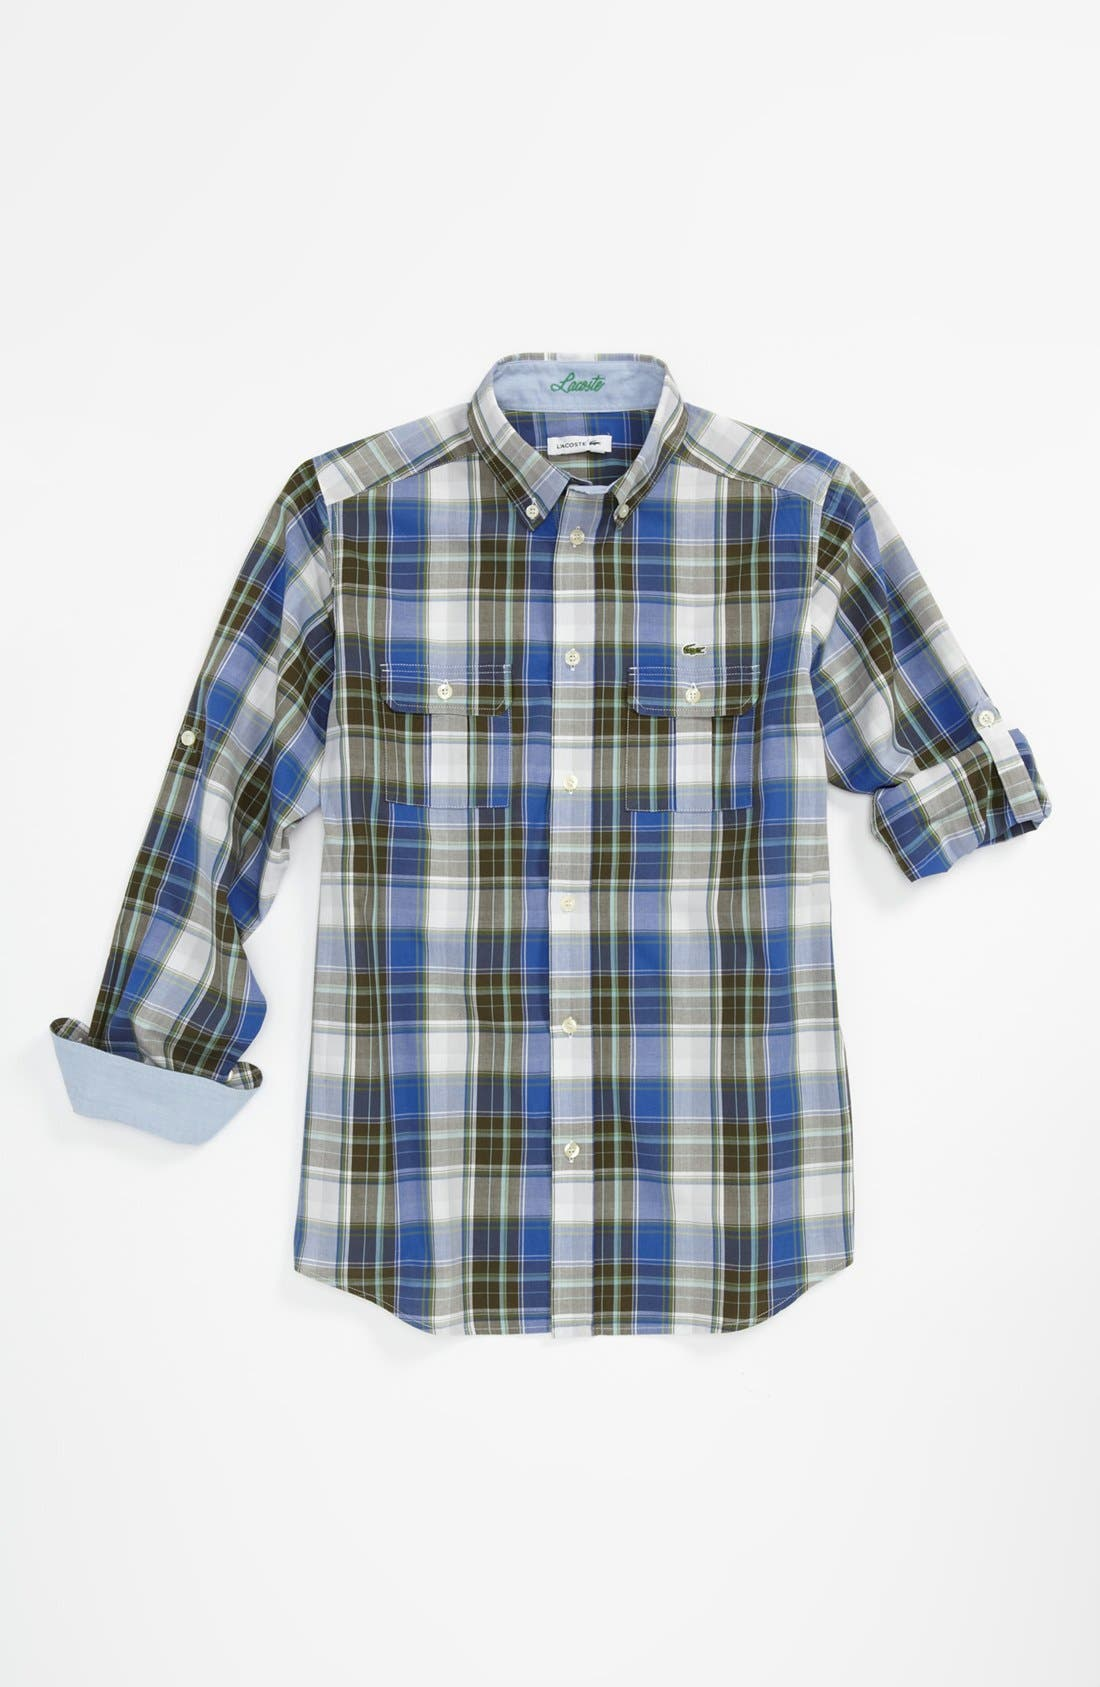 Alternate Image 1 Selected - Lacoste Plaid Woven Shirt (Little Boys & Big Boys)